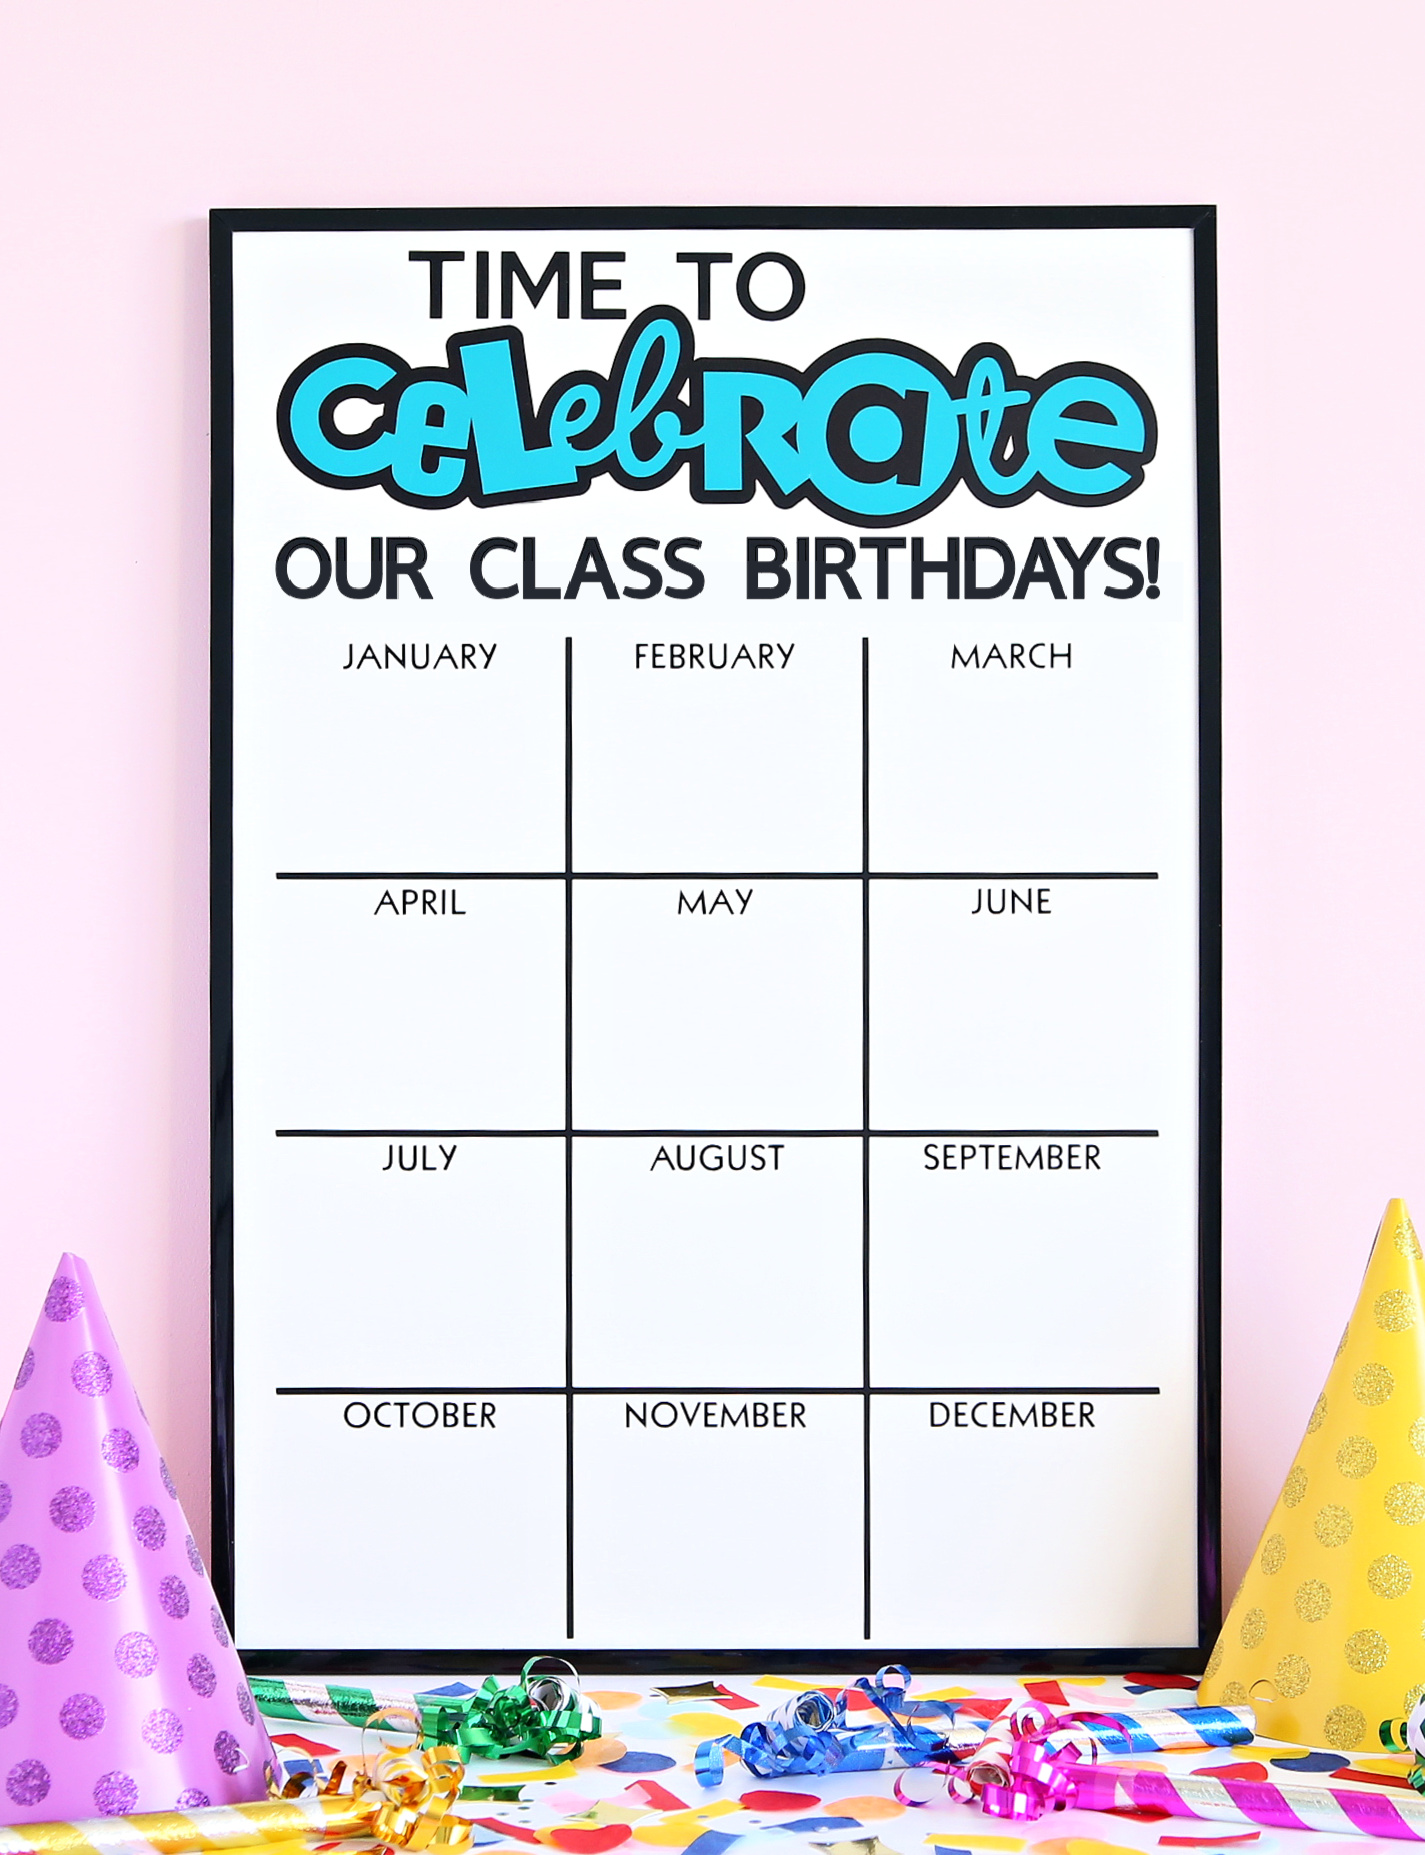 Classroom Birthday Board made using Cricut Explore 3